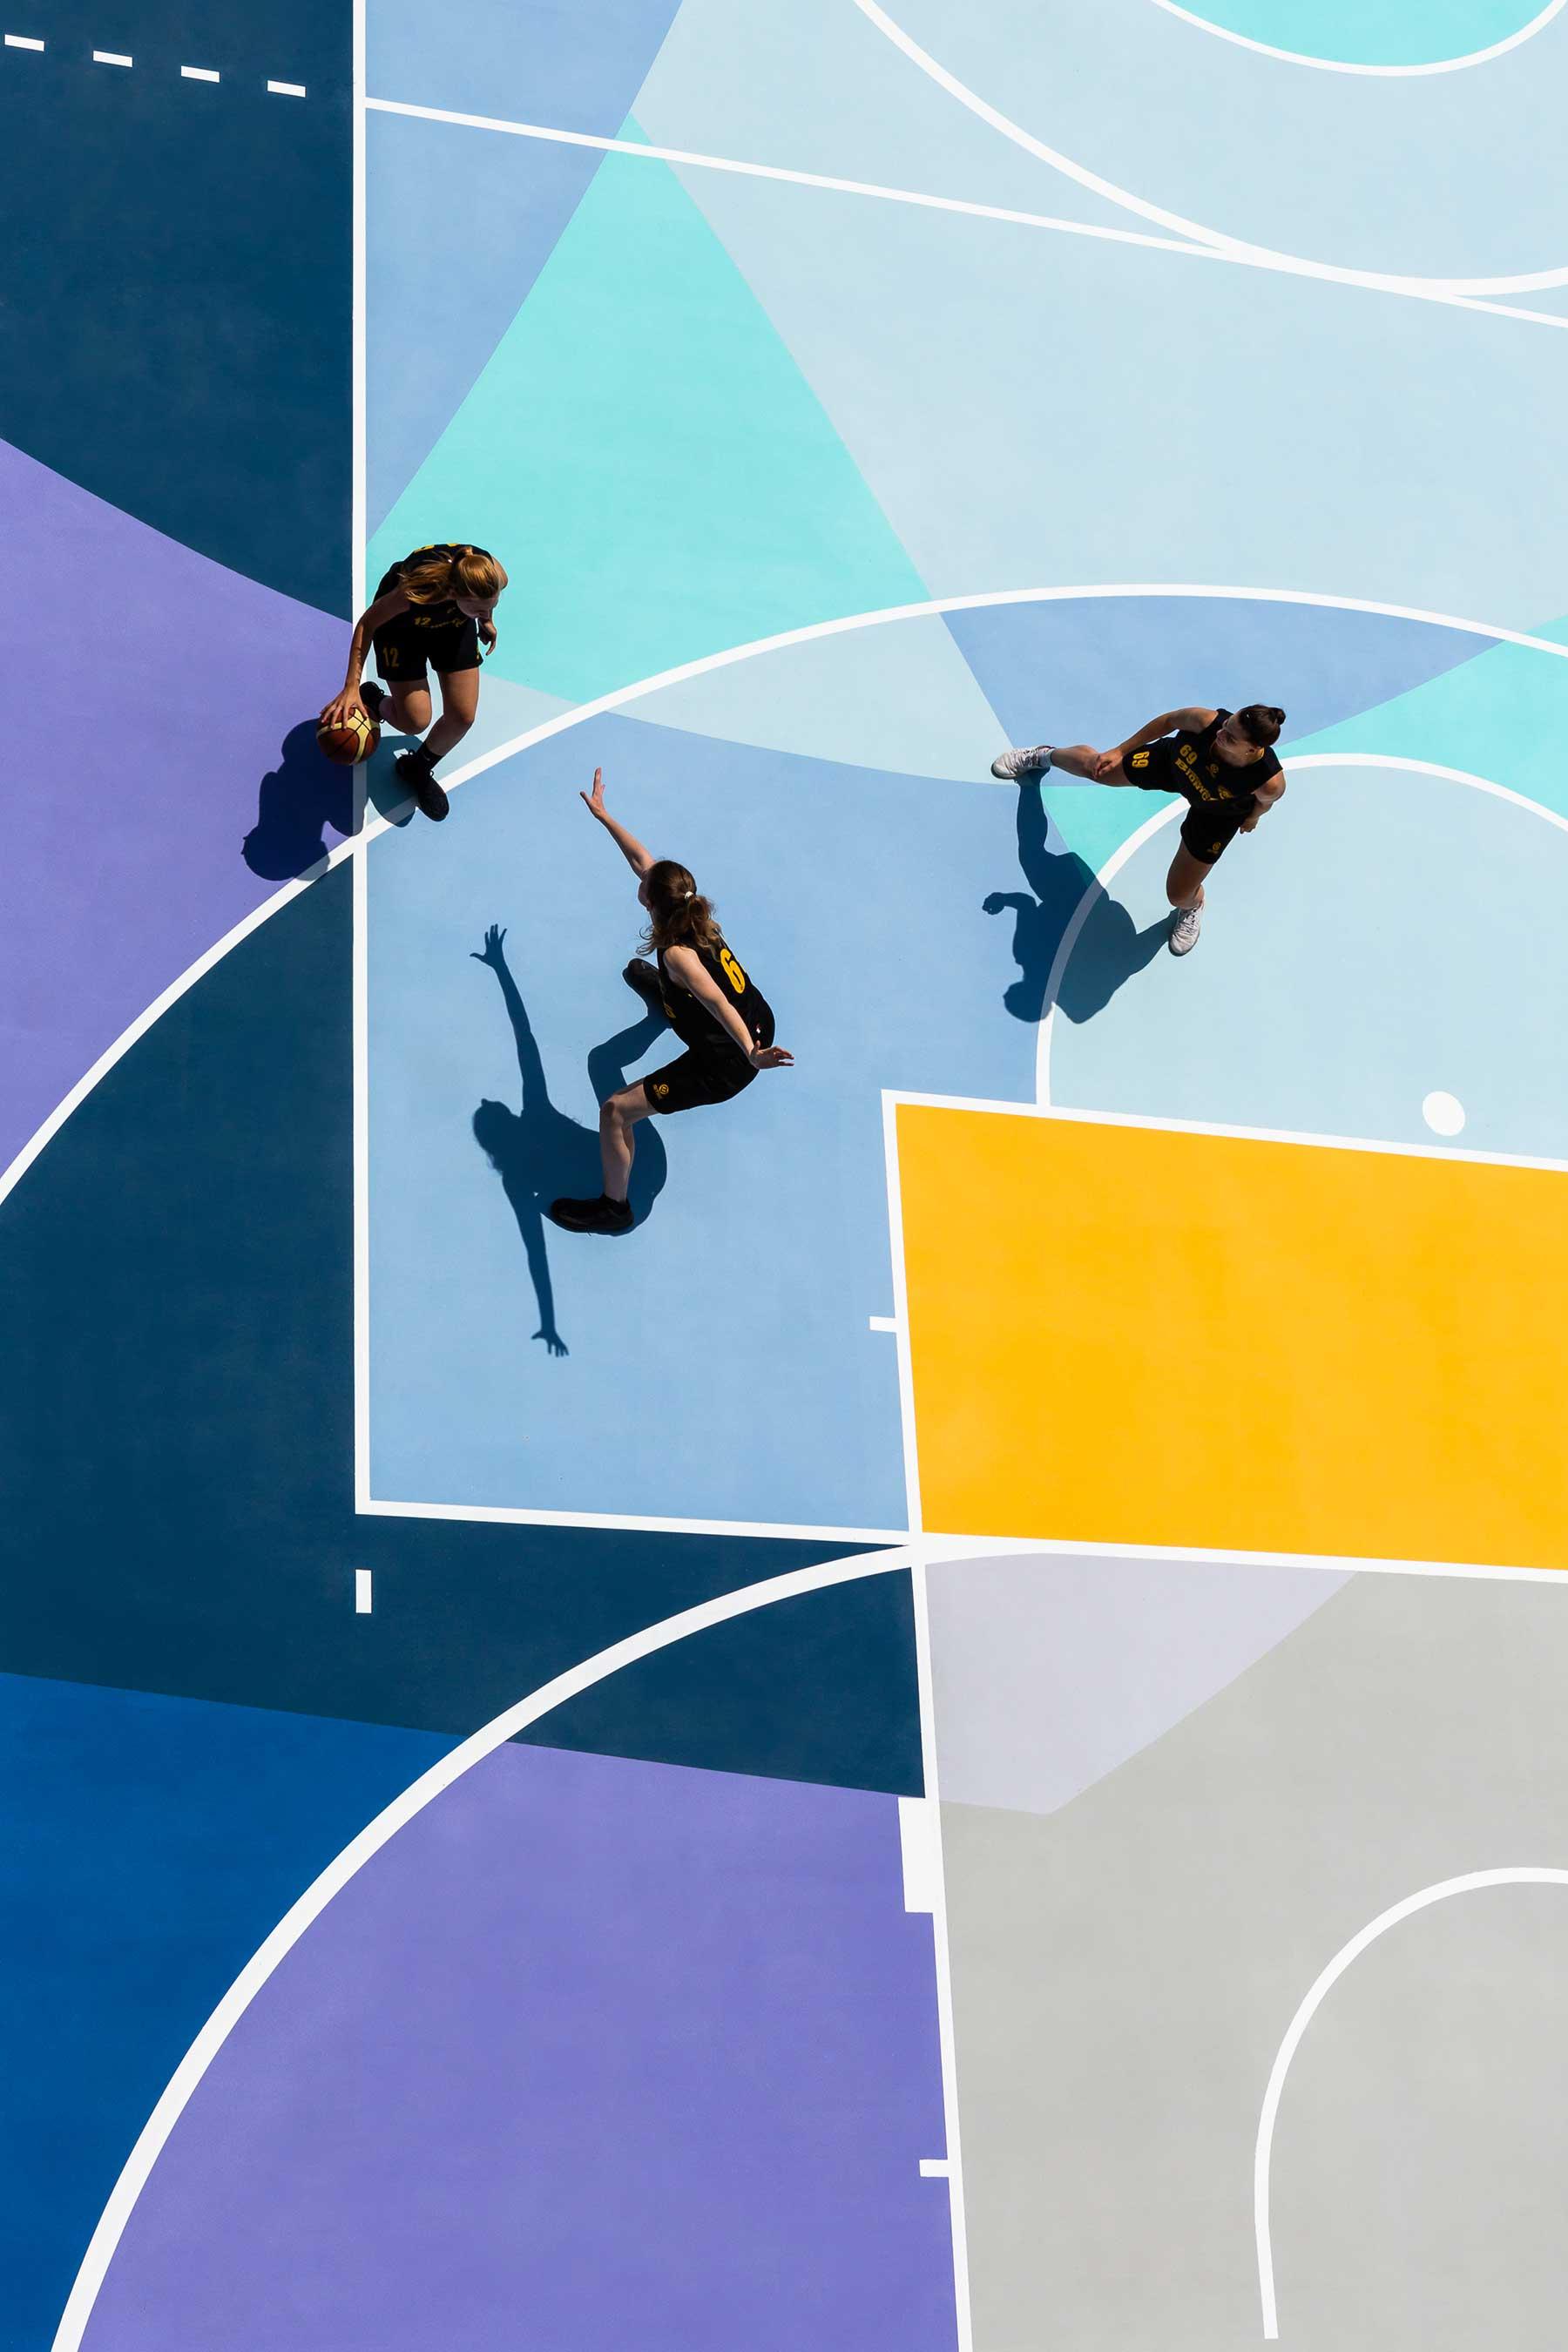 Farbenfrohe Basketballplätze von Gummy Gue Gummy-Gue-bunter-basketballplatz-Buccinasco_02